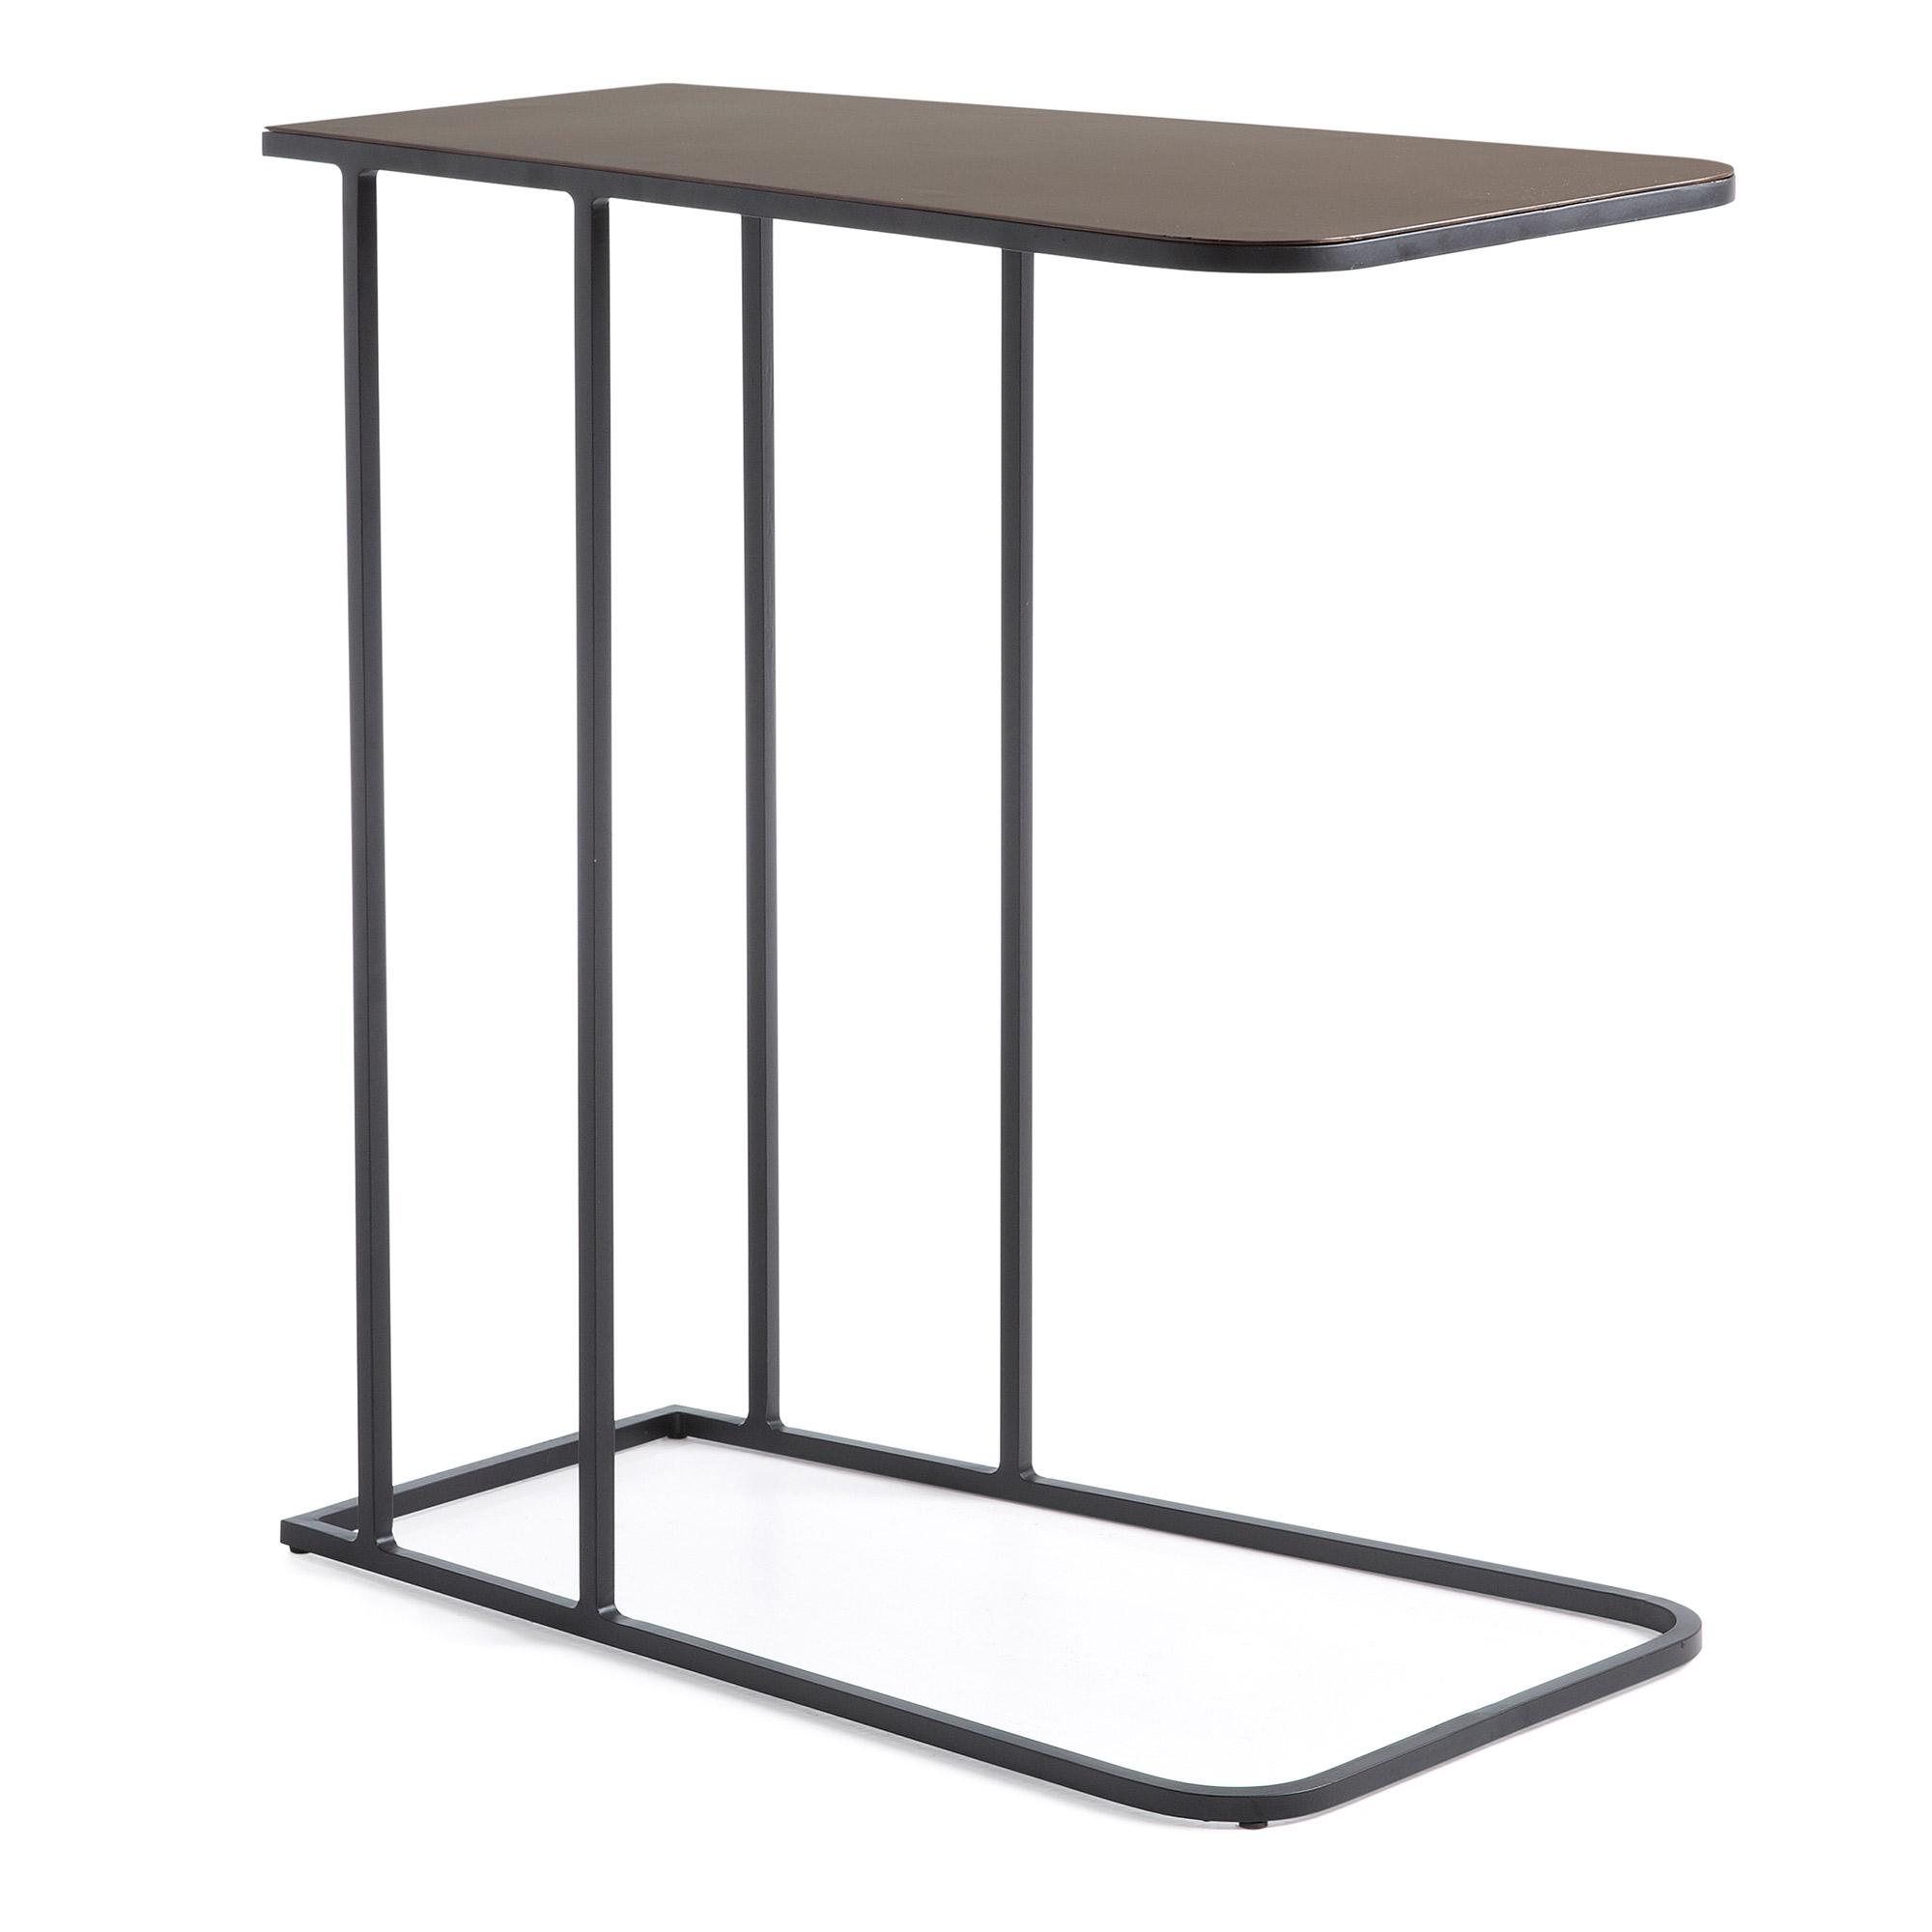 Kave home - table d'appoint vinker g 56 x 33 cm